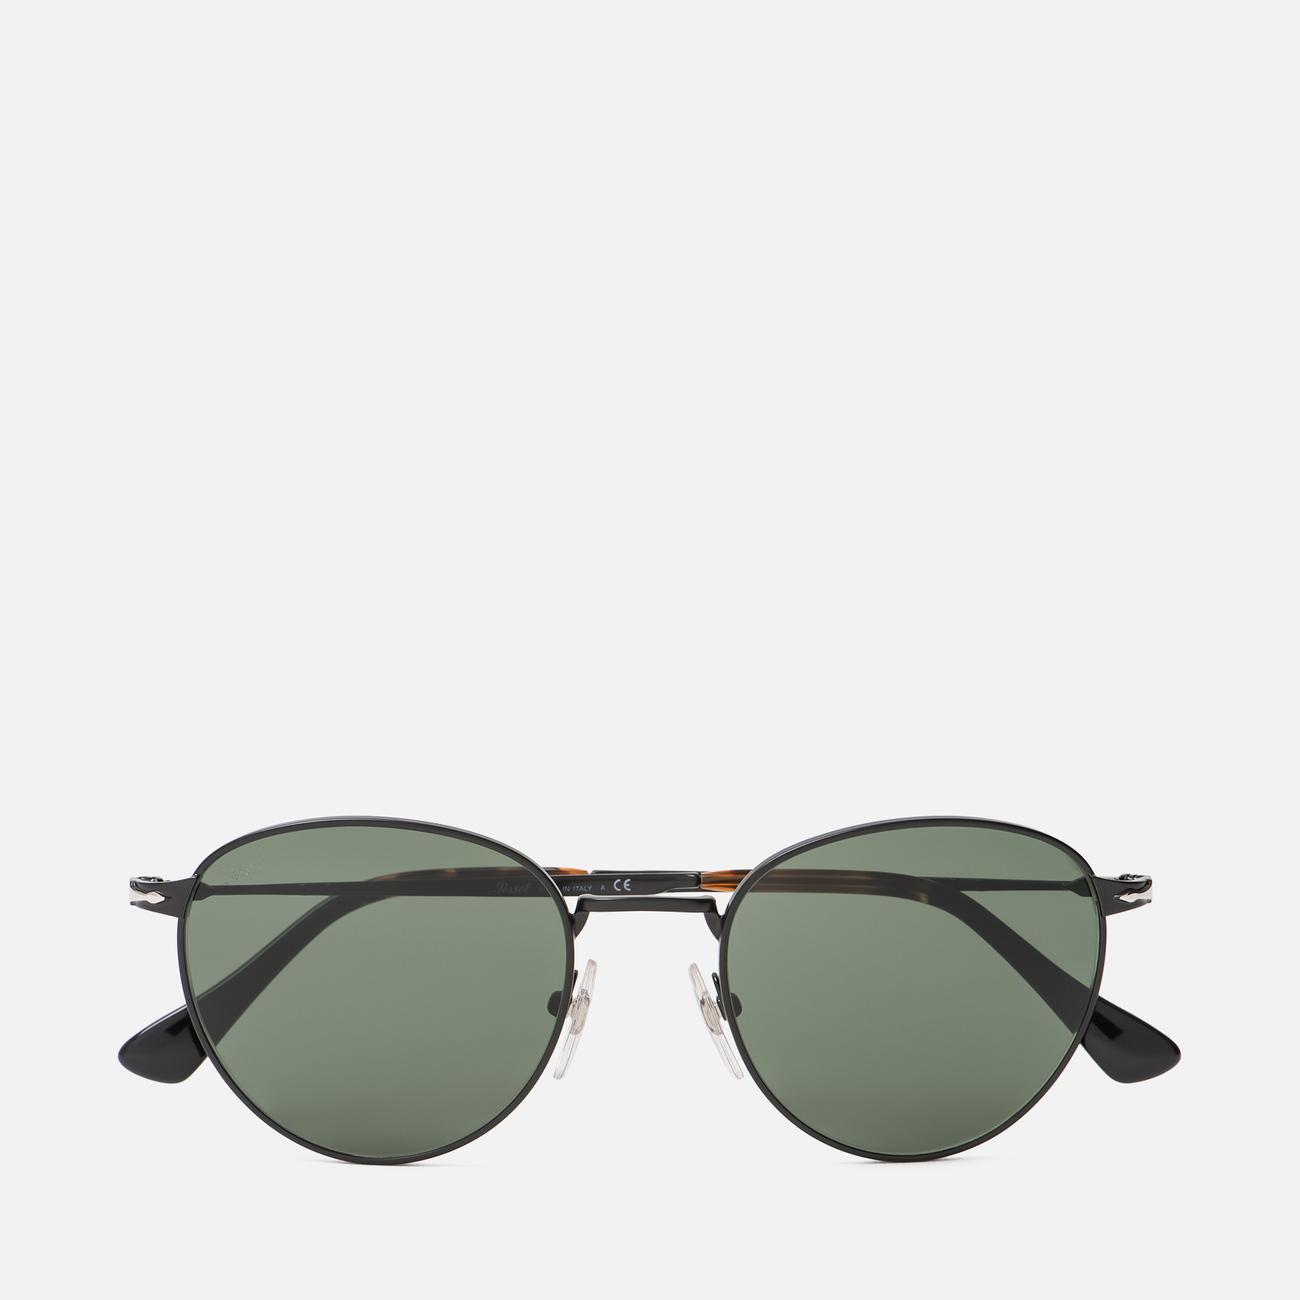 Солнцезащитные очки Persol PO2445S Metal Capsule Black/Green